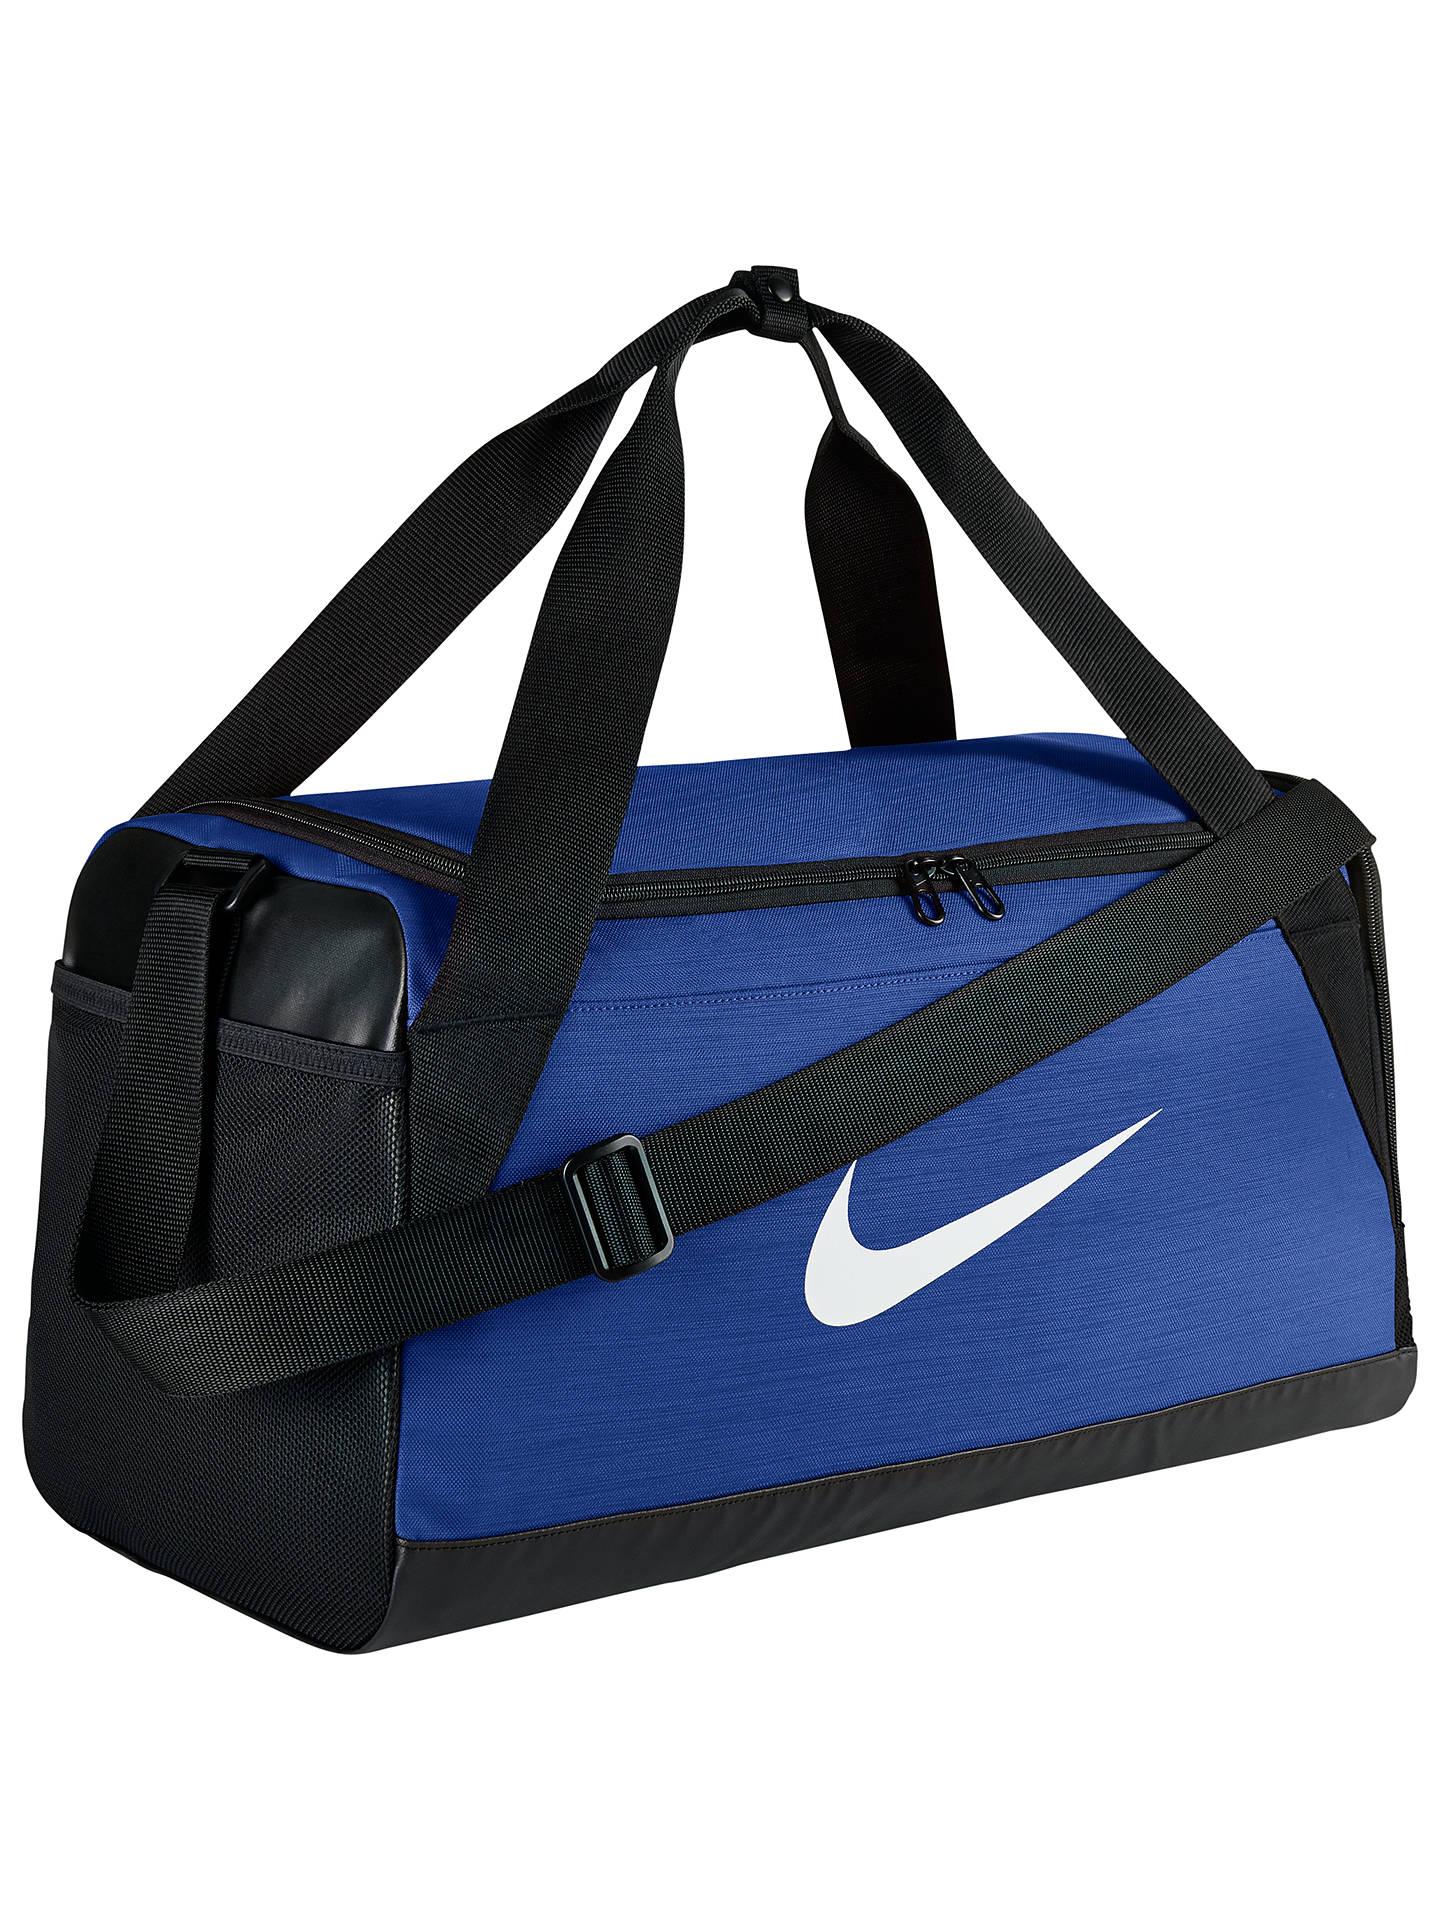 BuyNike Brasilia Training Duffle Bag 59d8c2a1e70d3